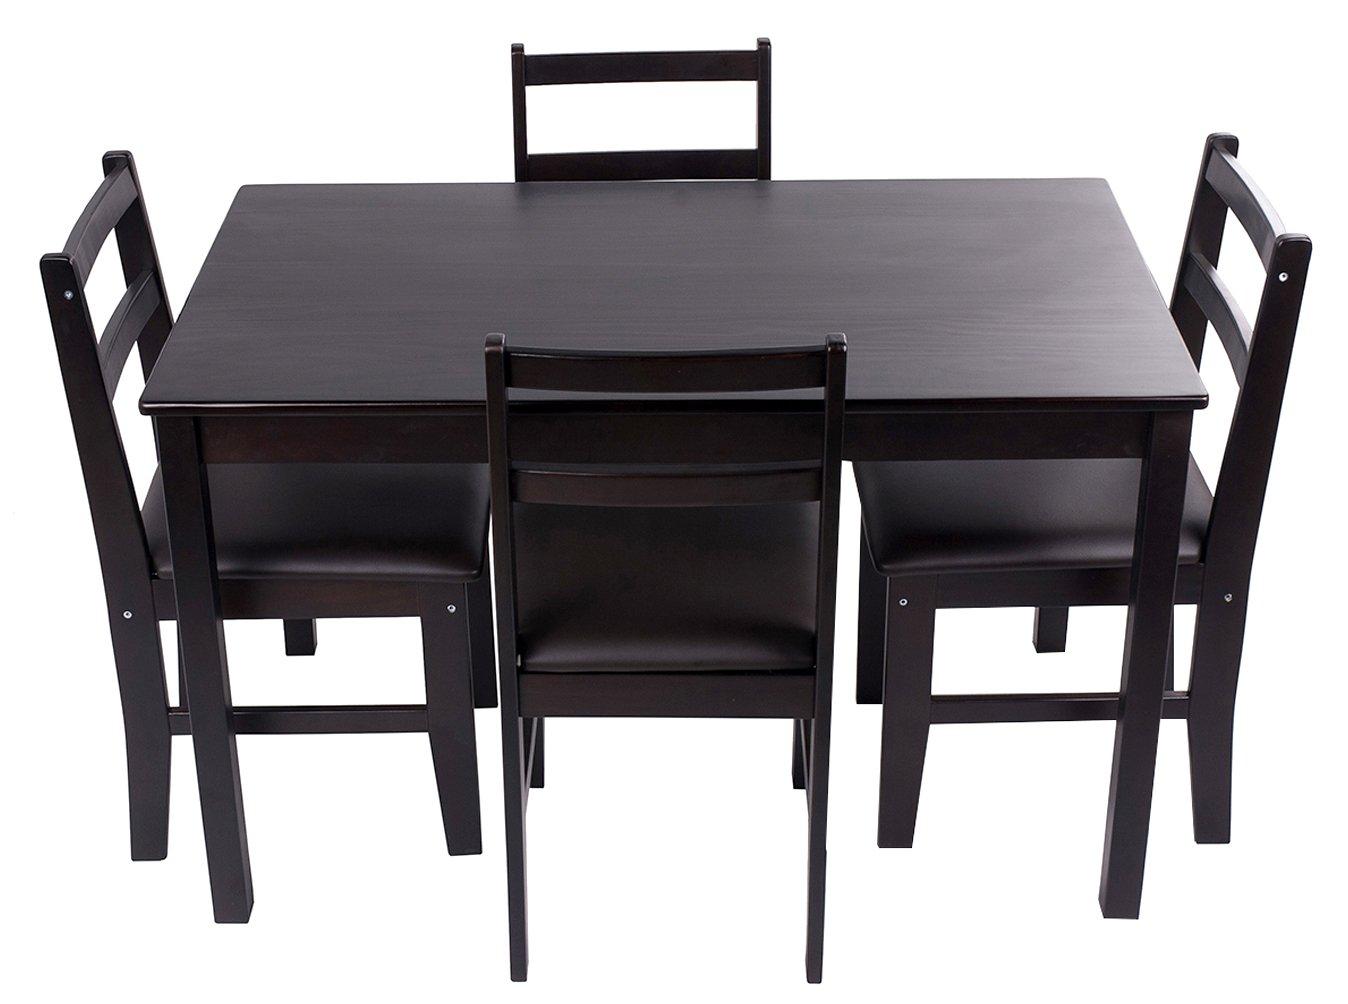 Merax 47'' Rectangular Dinning Table in Dark Espresso 100% New Zealand Pine Wood Finish by Merax (Image #5)